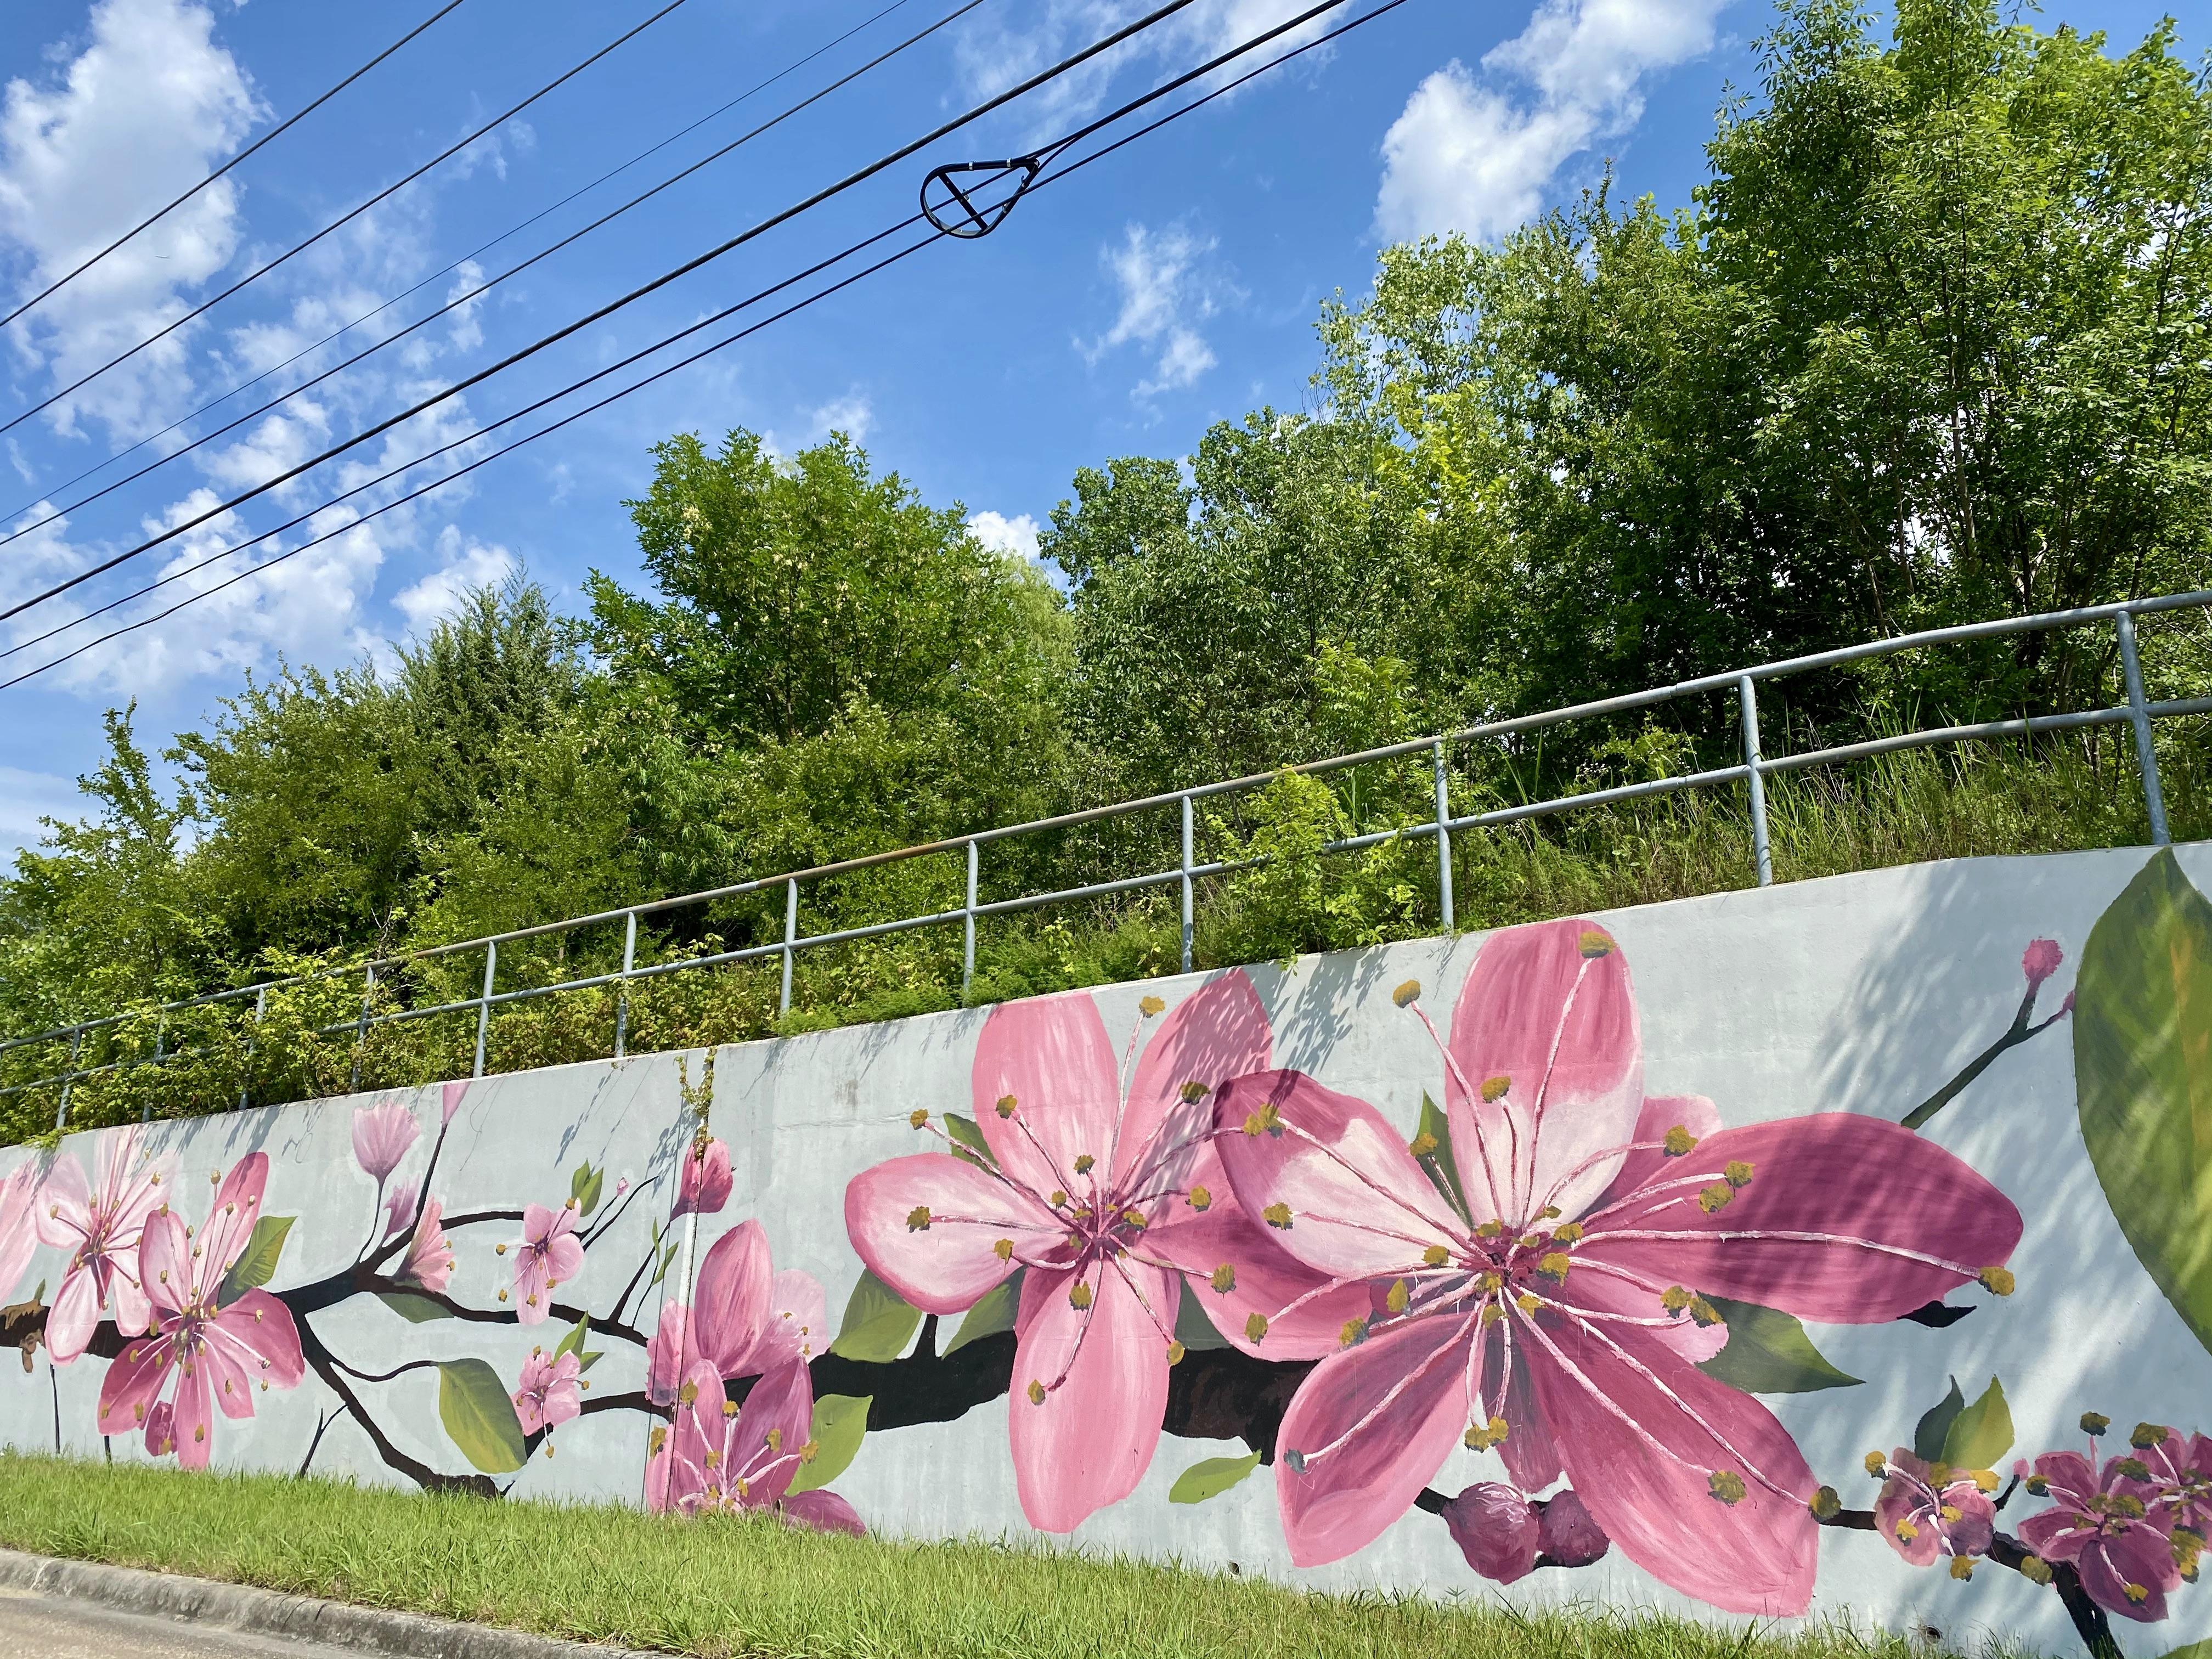 Randol Mill Road Murals in Woodhaven, TX